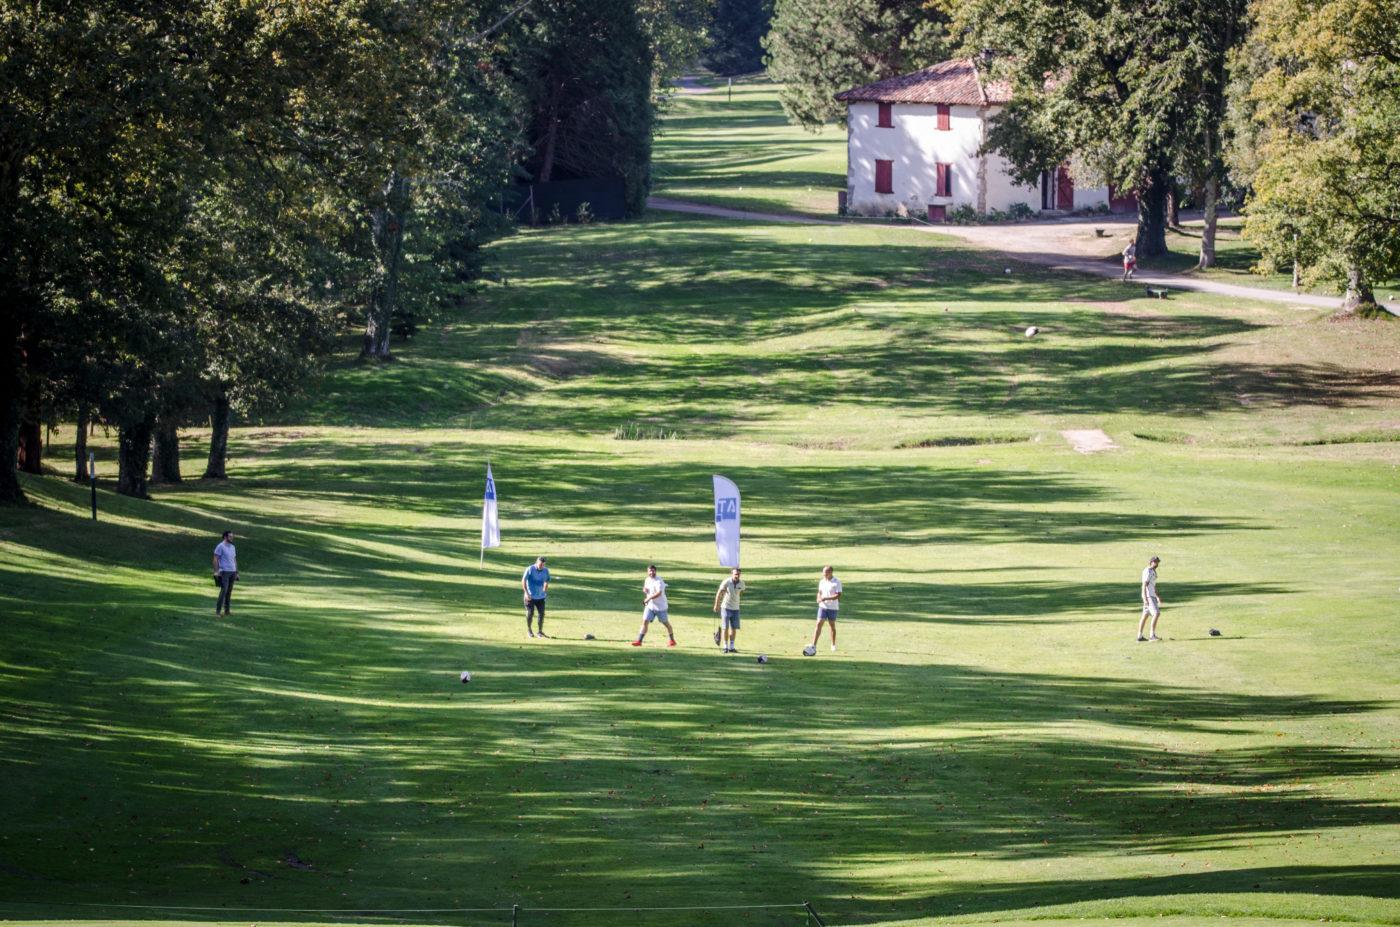 Événement Rugby Golf IRPB 2019 Chantaco Inter réseau Pays basque Agence Erronda